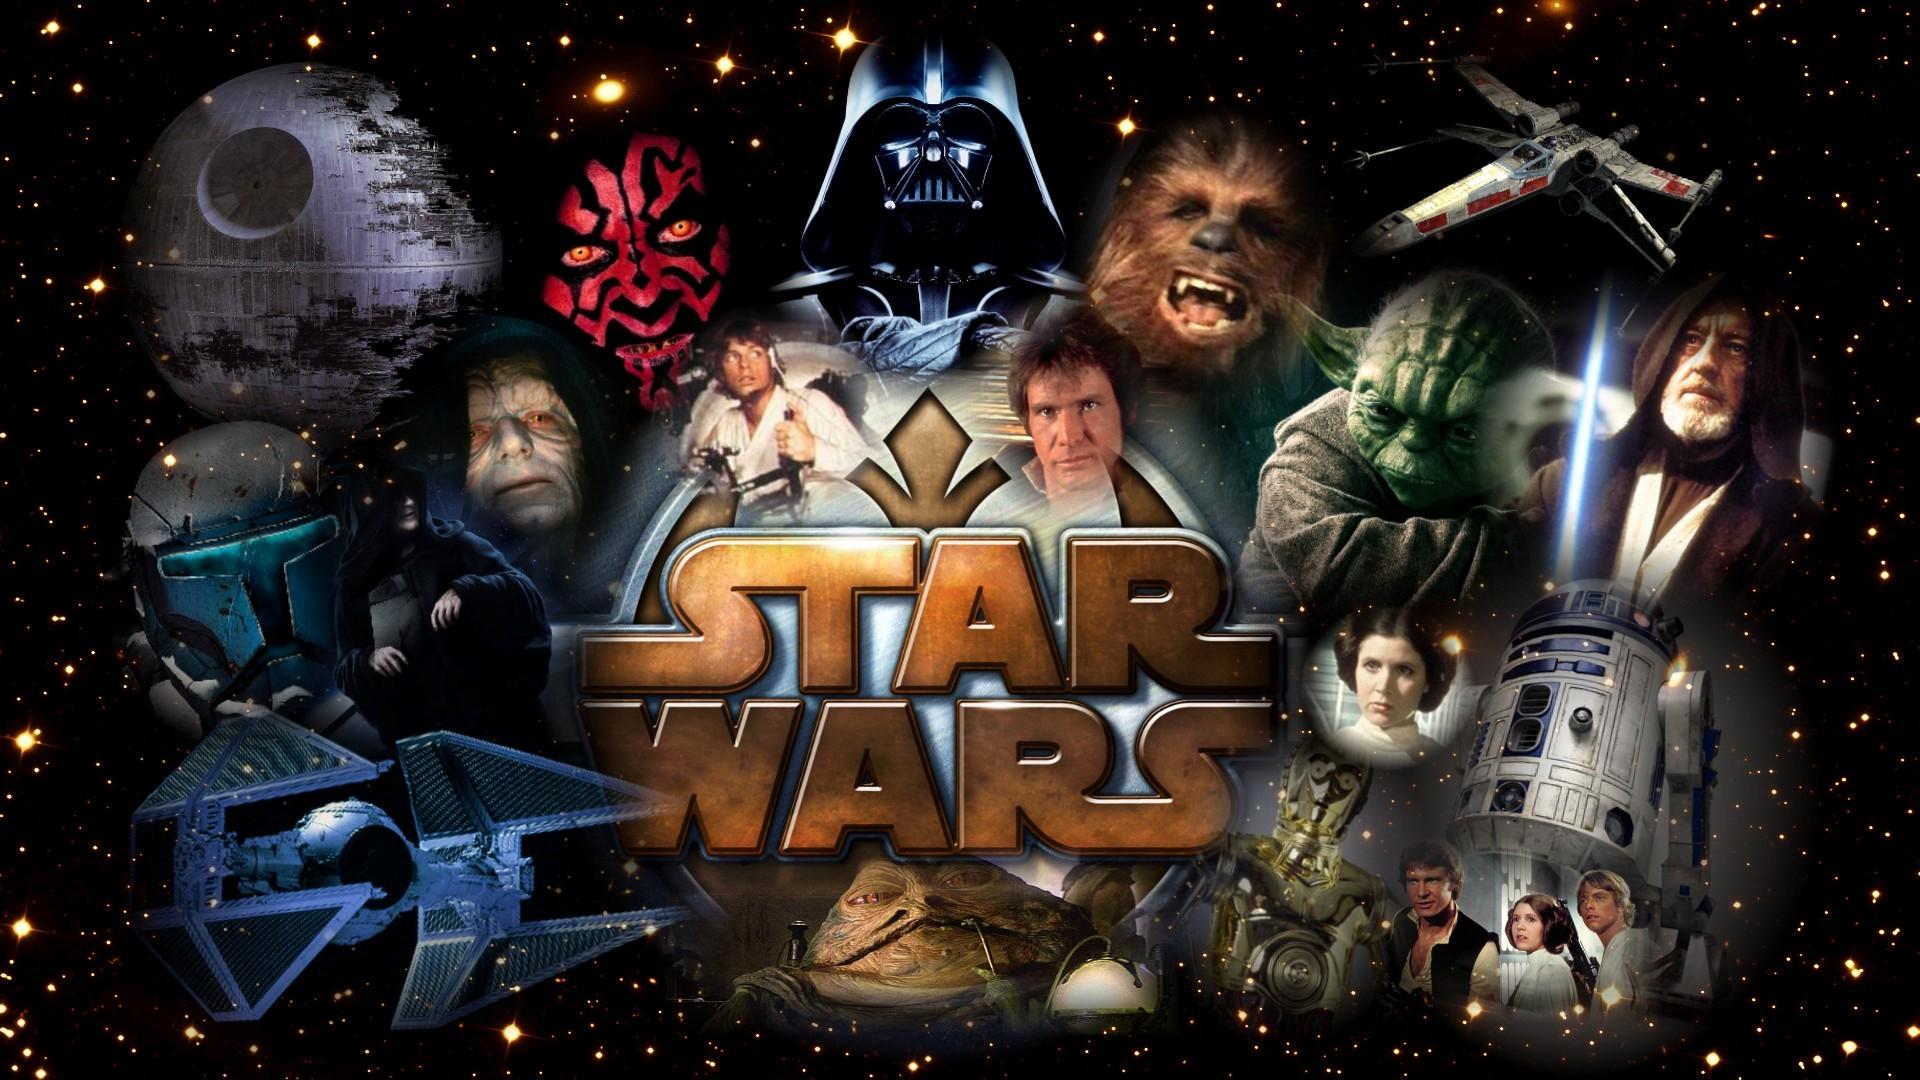 Star Wars филми